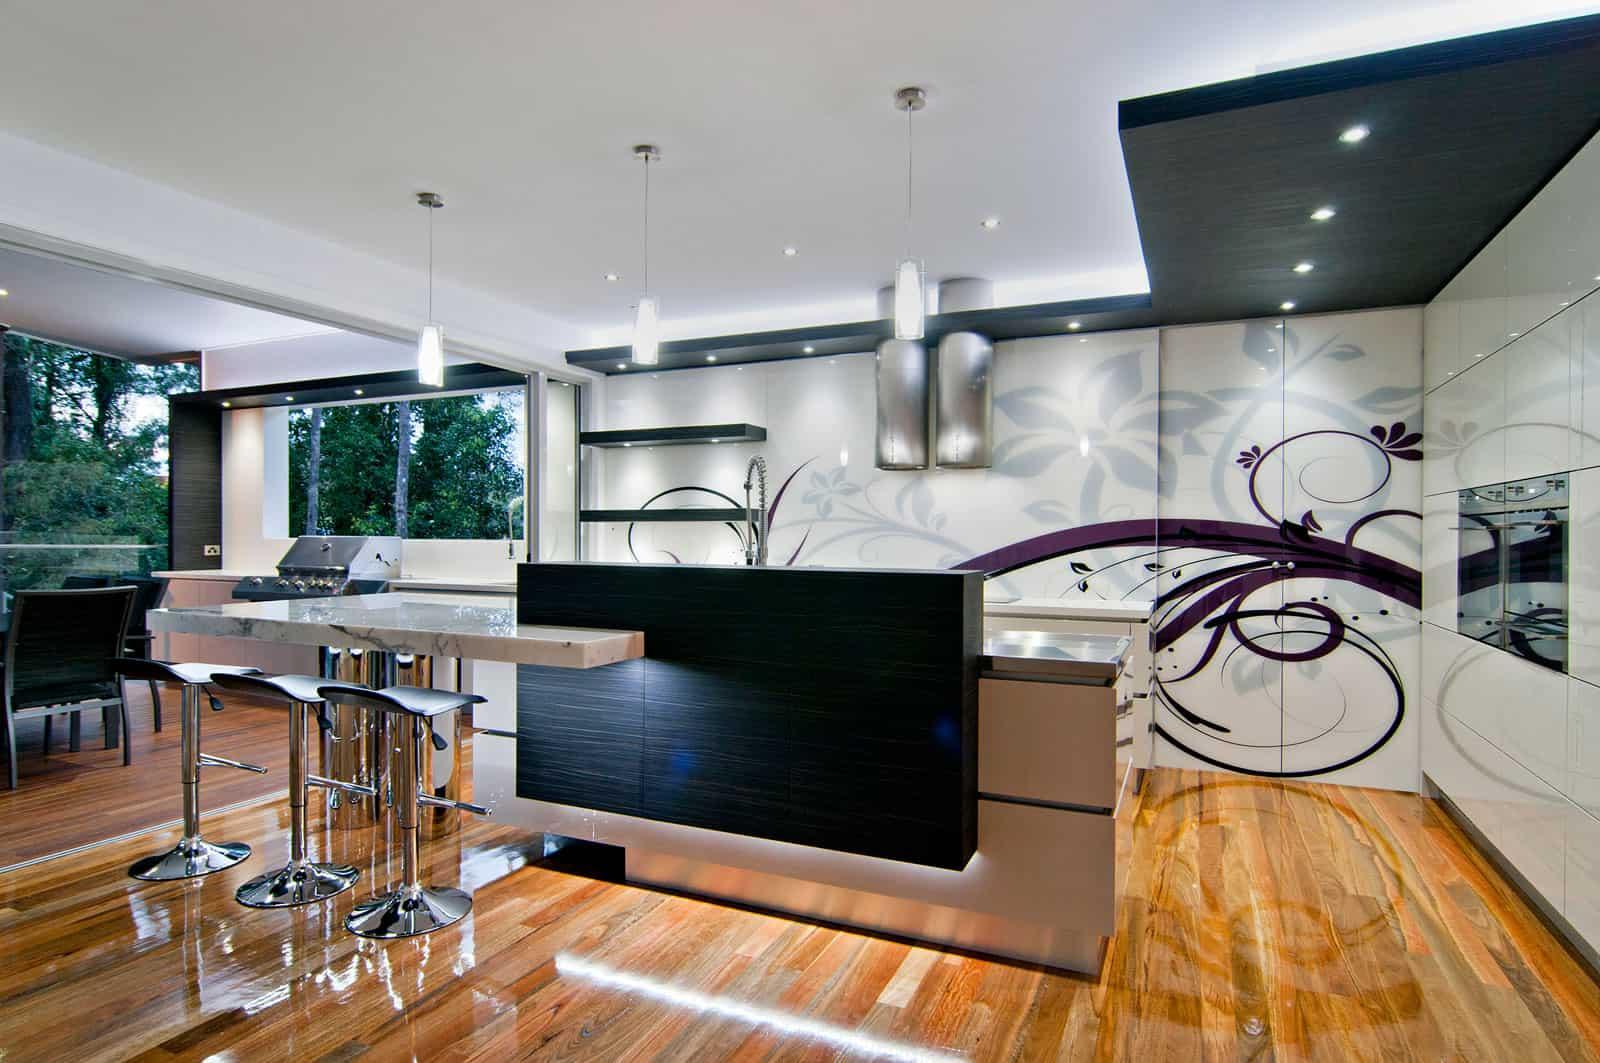 Bushland retreat designer kitchen by sublime architectural interiors